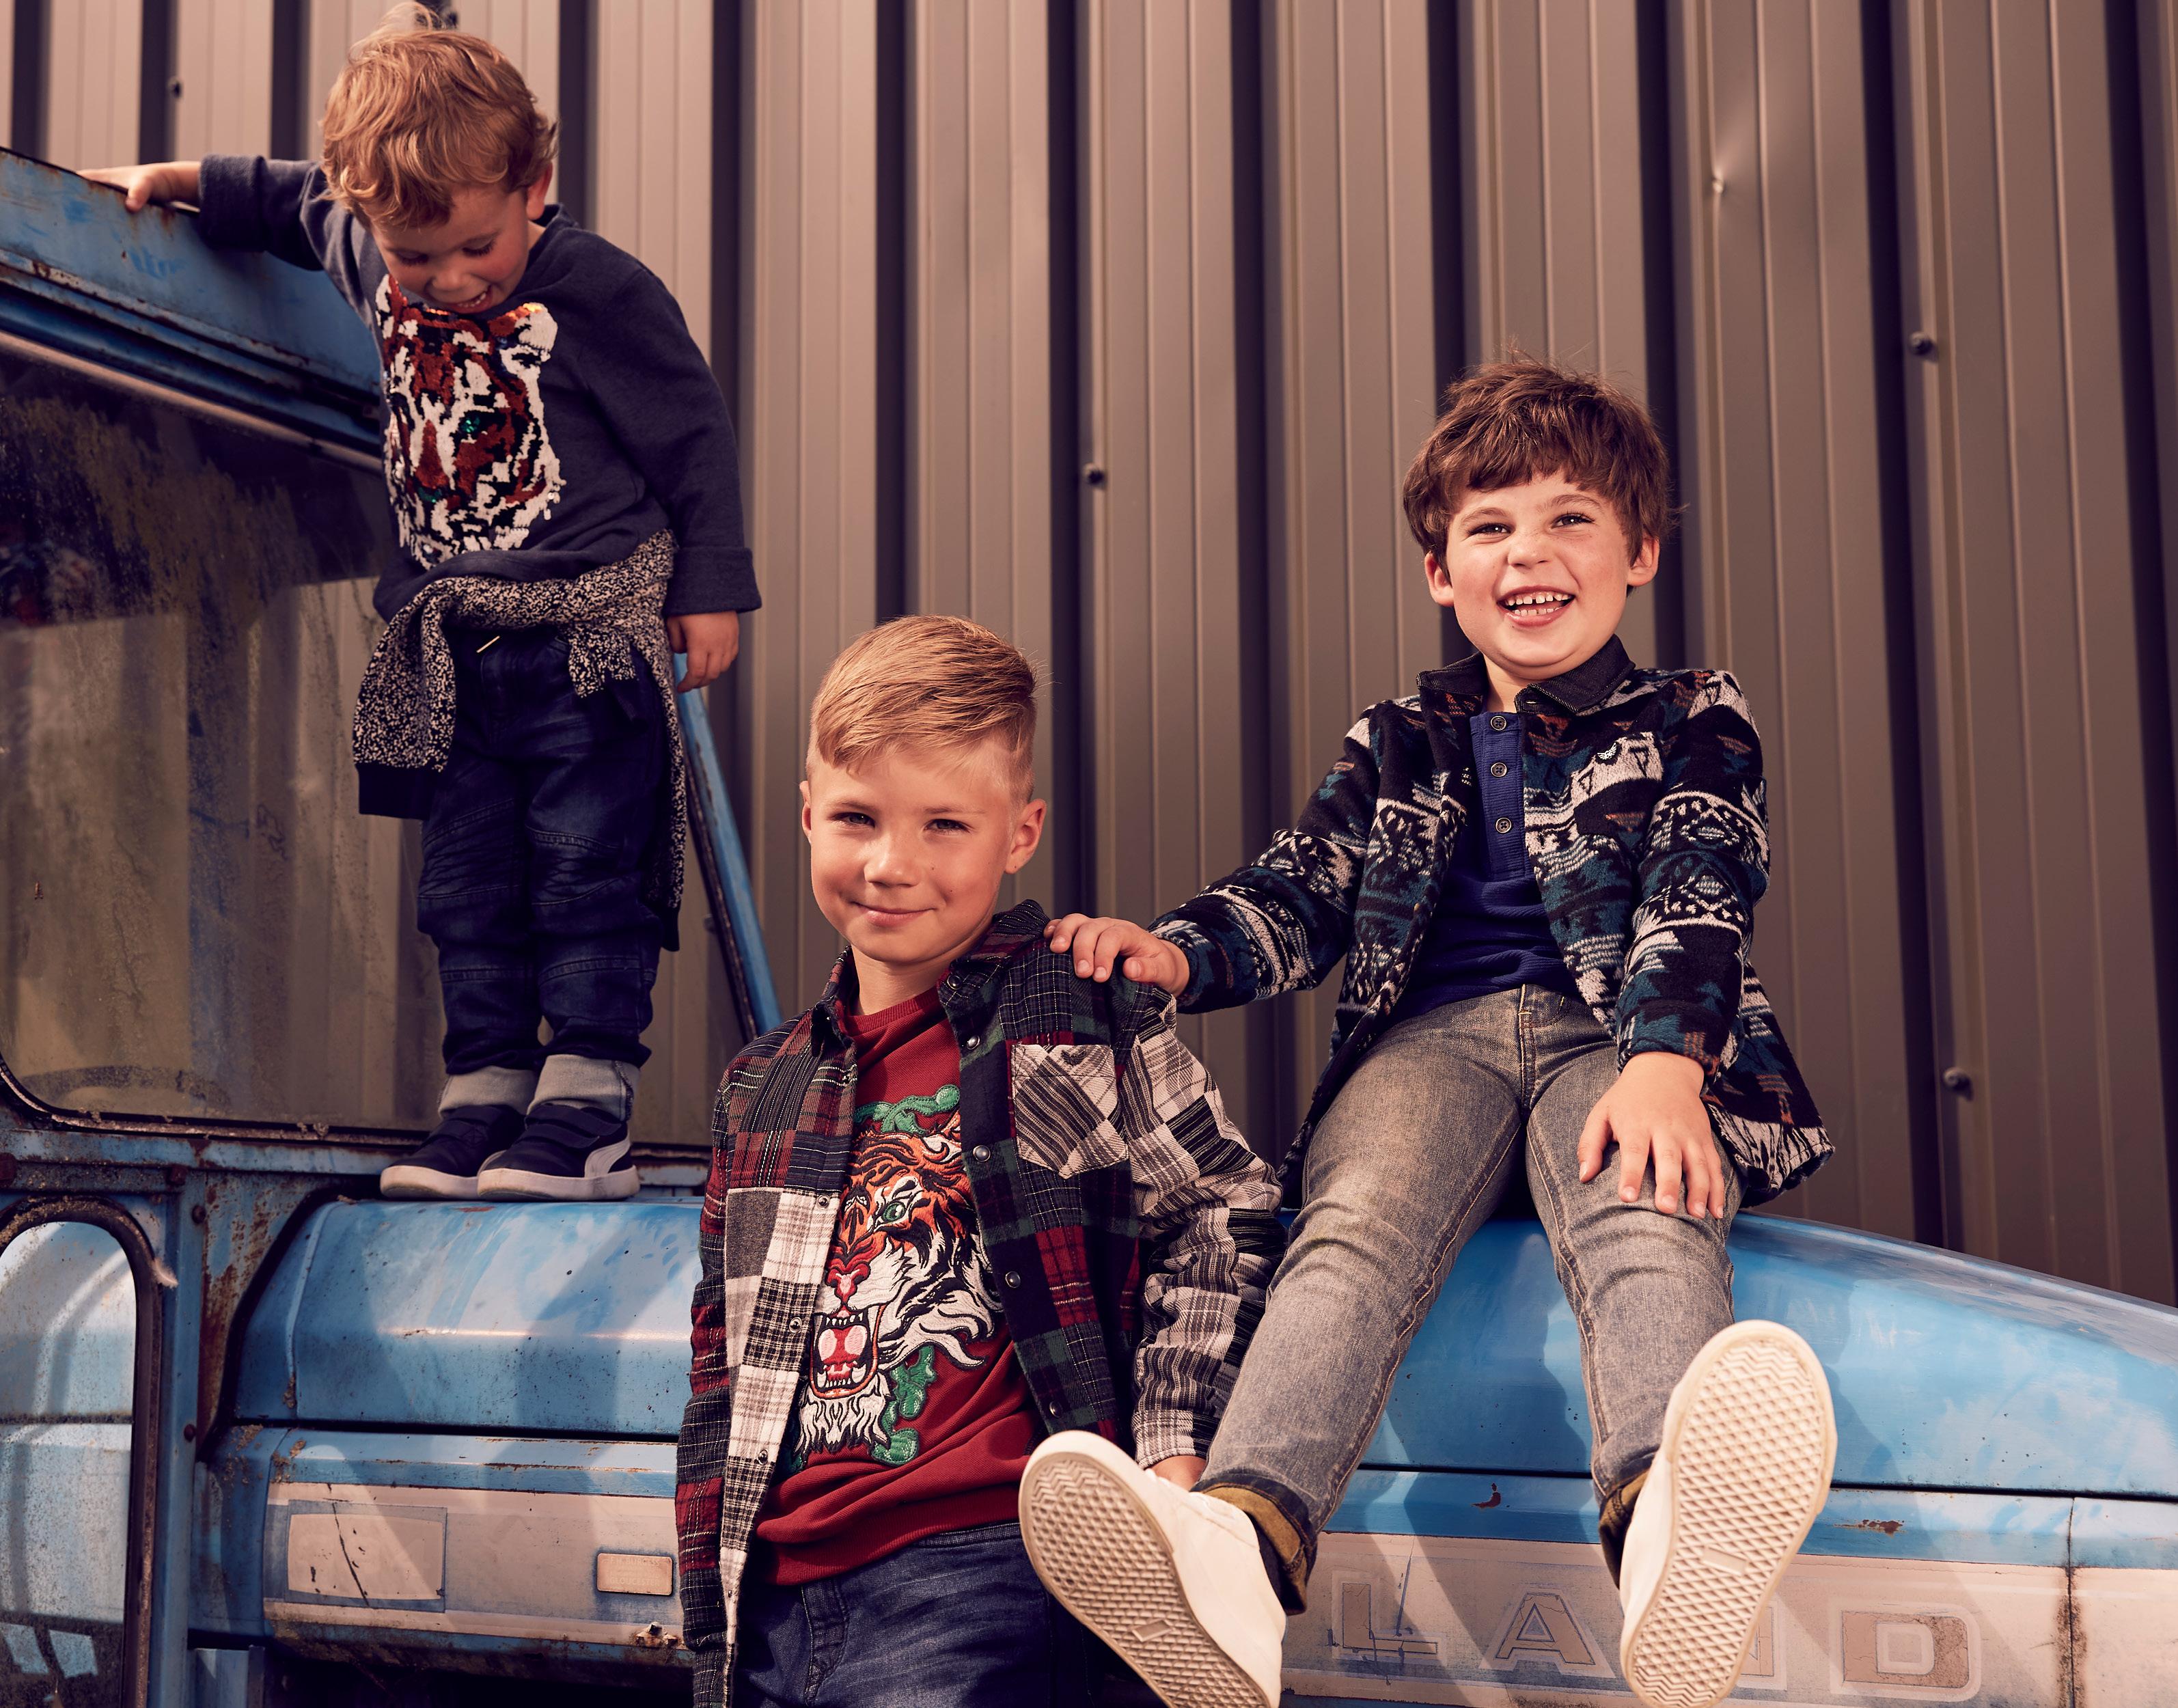 FG4_BOYS BANNERS10